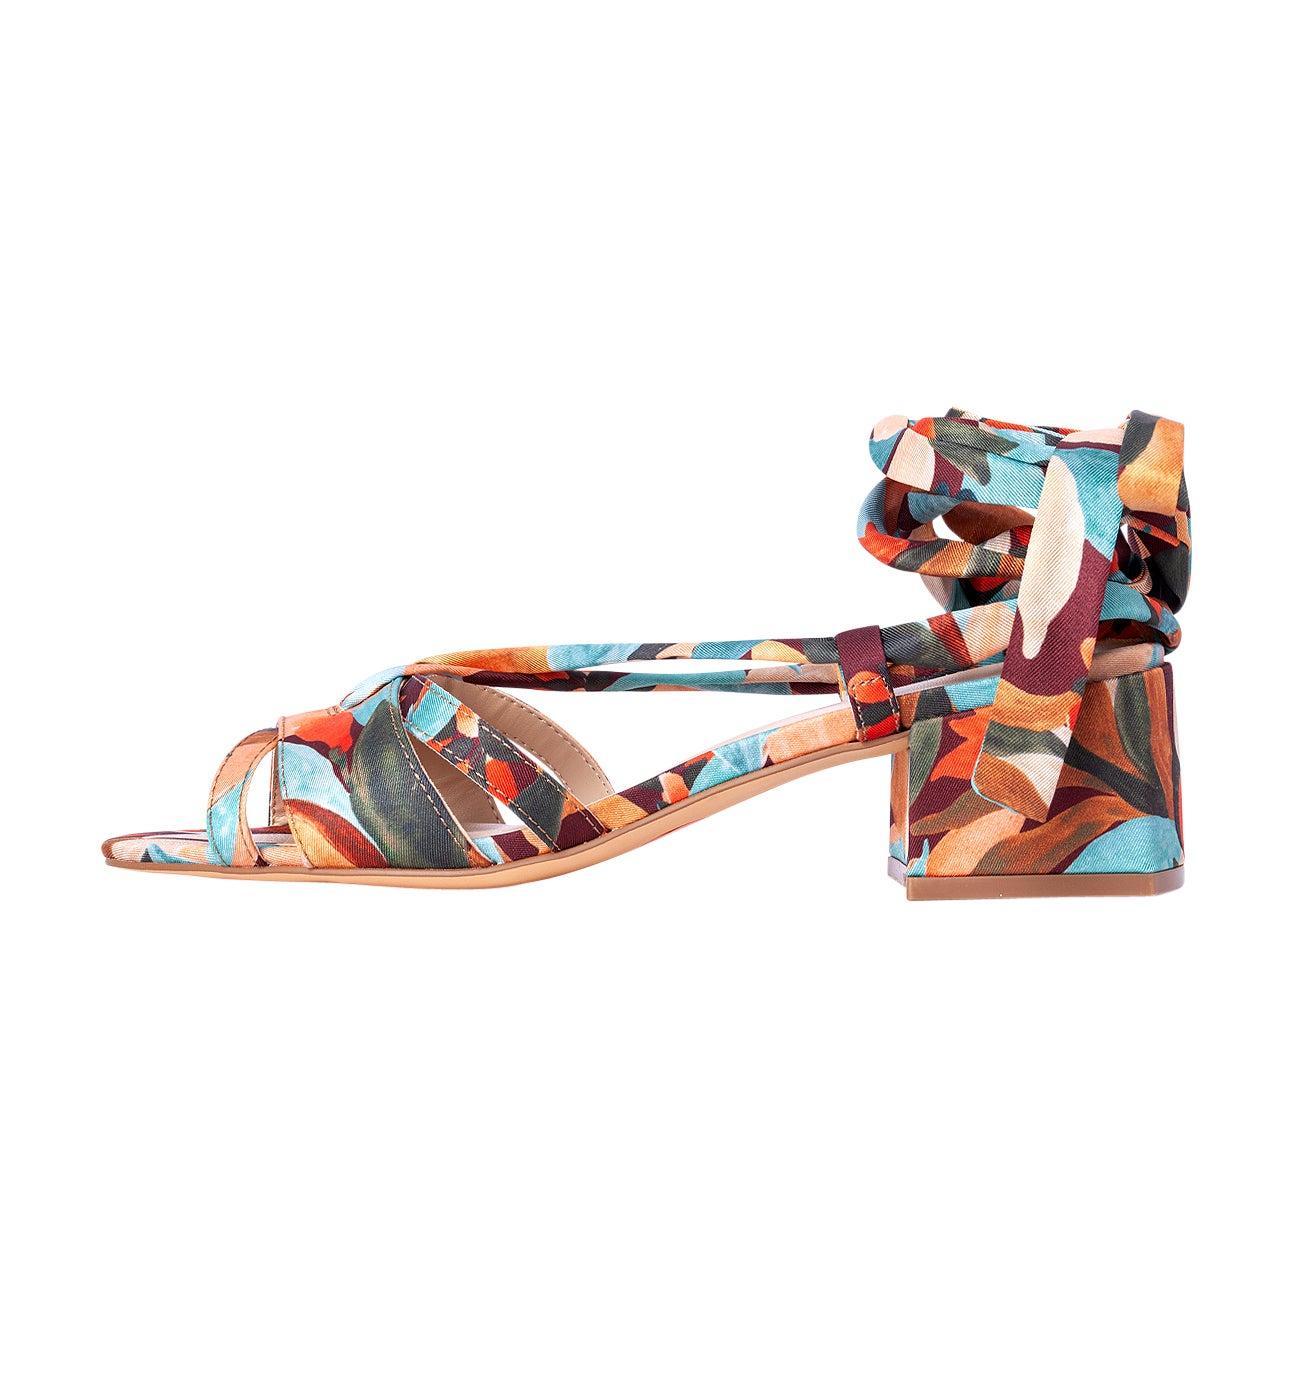 Sandales imprimées Femme